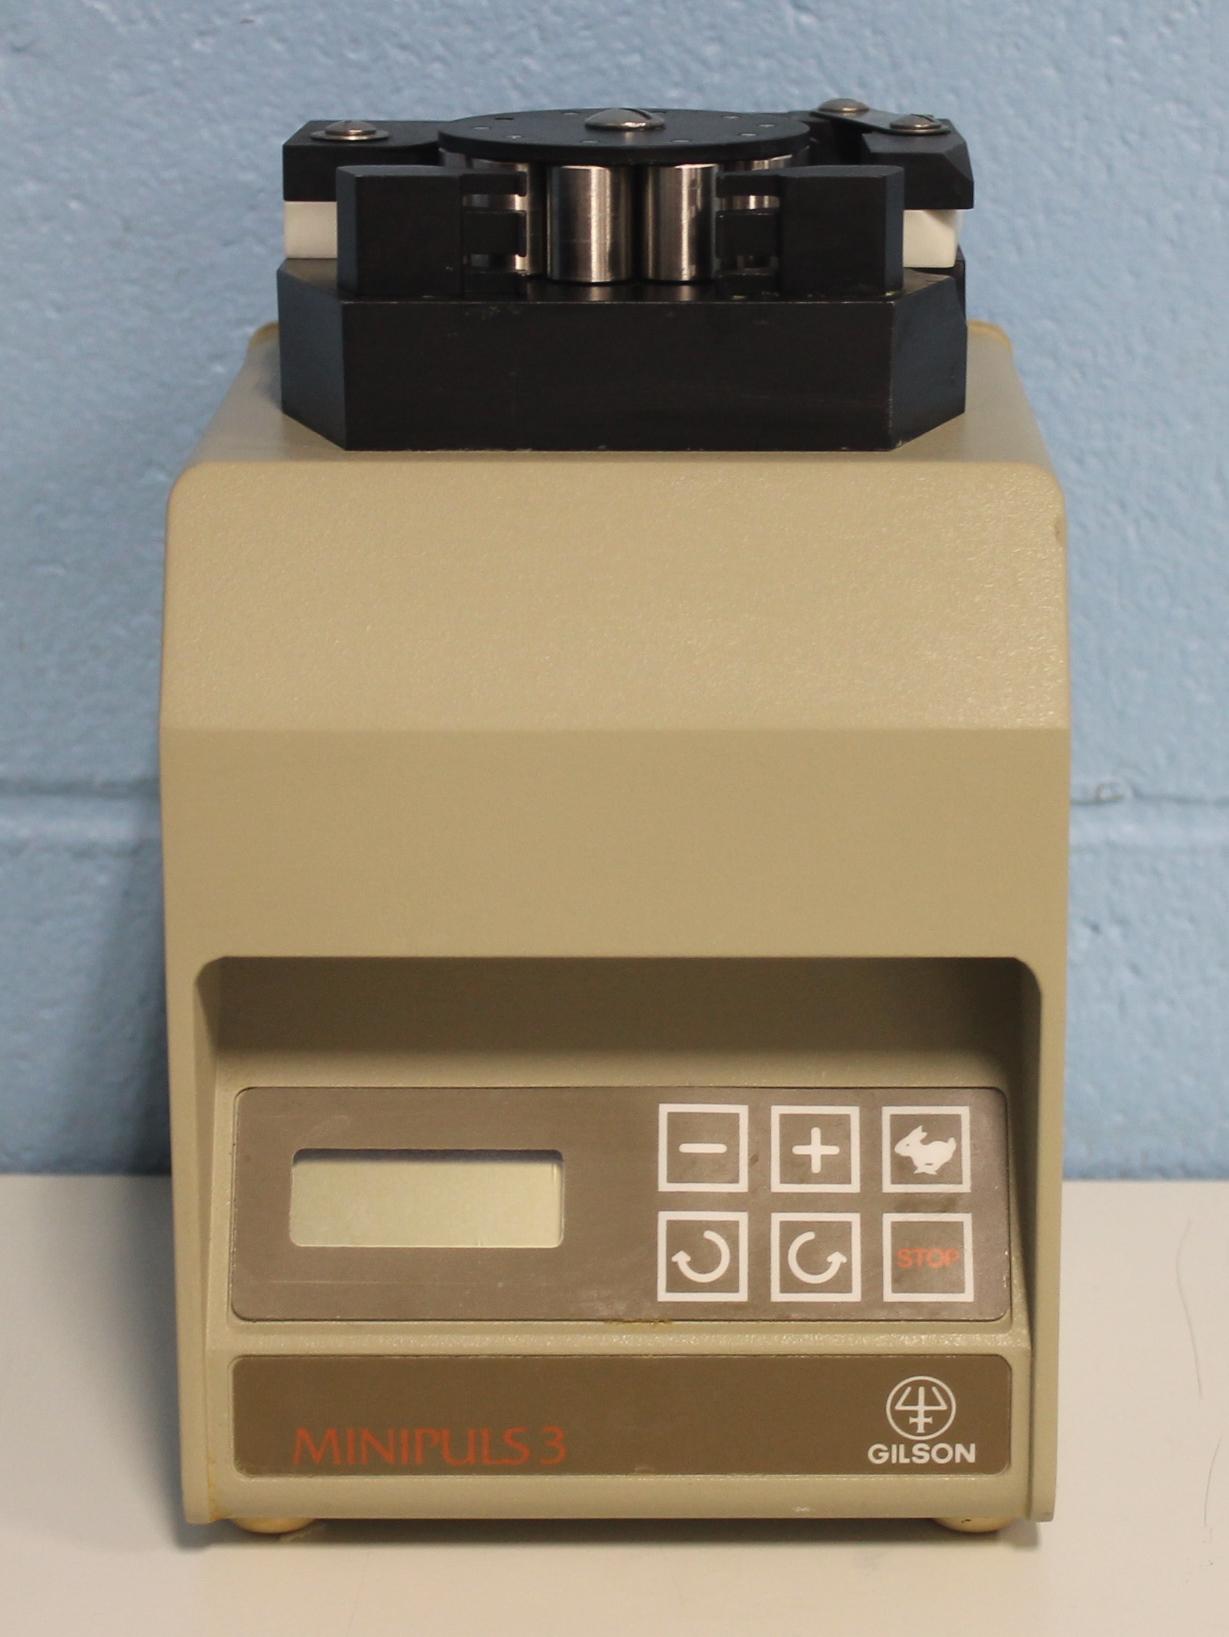 Gilson MiniPuls 3 Peristaltic Pump Image